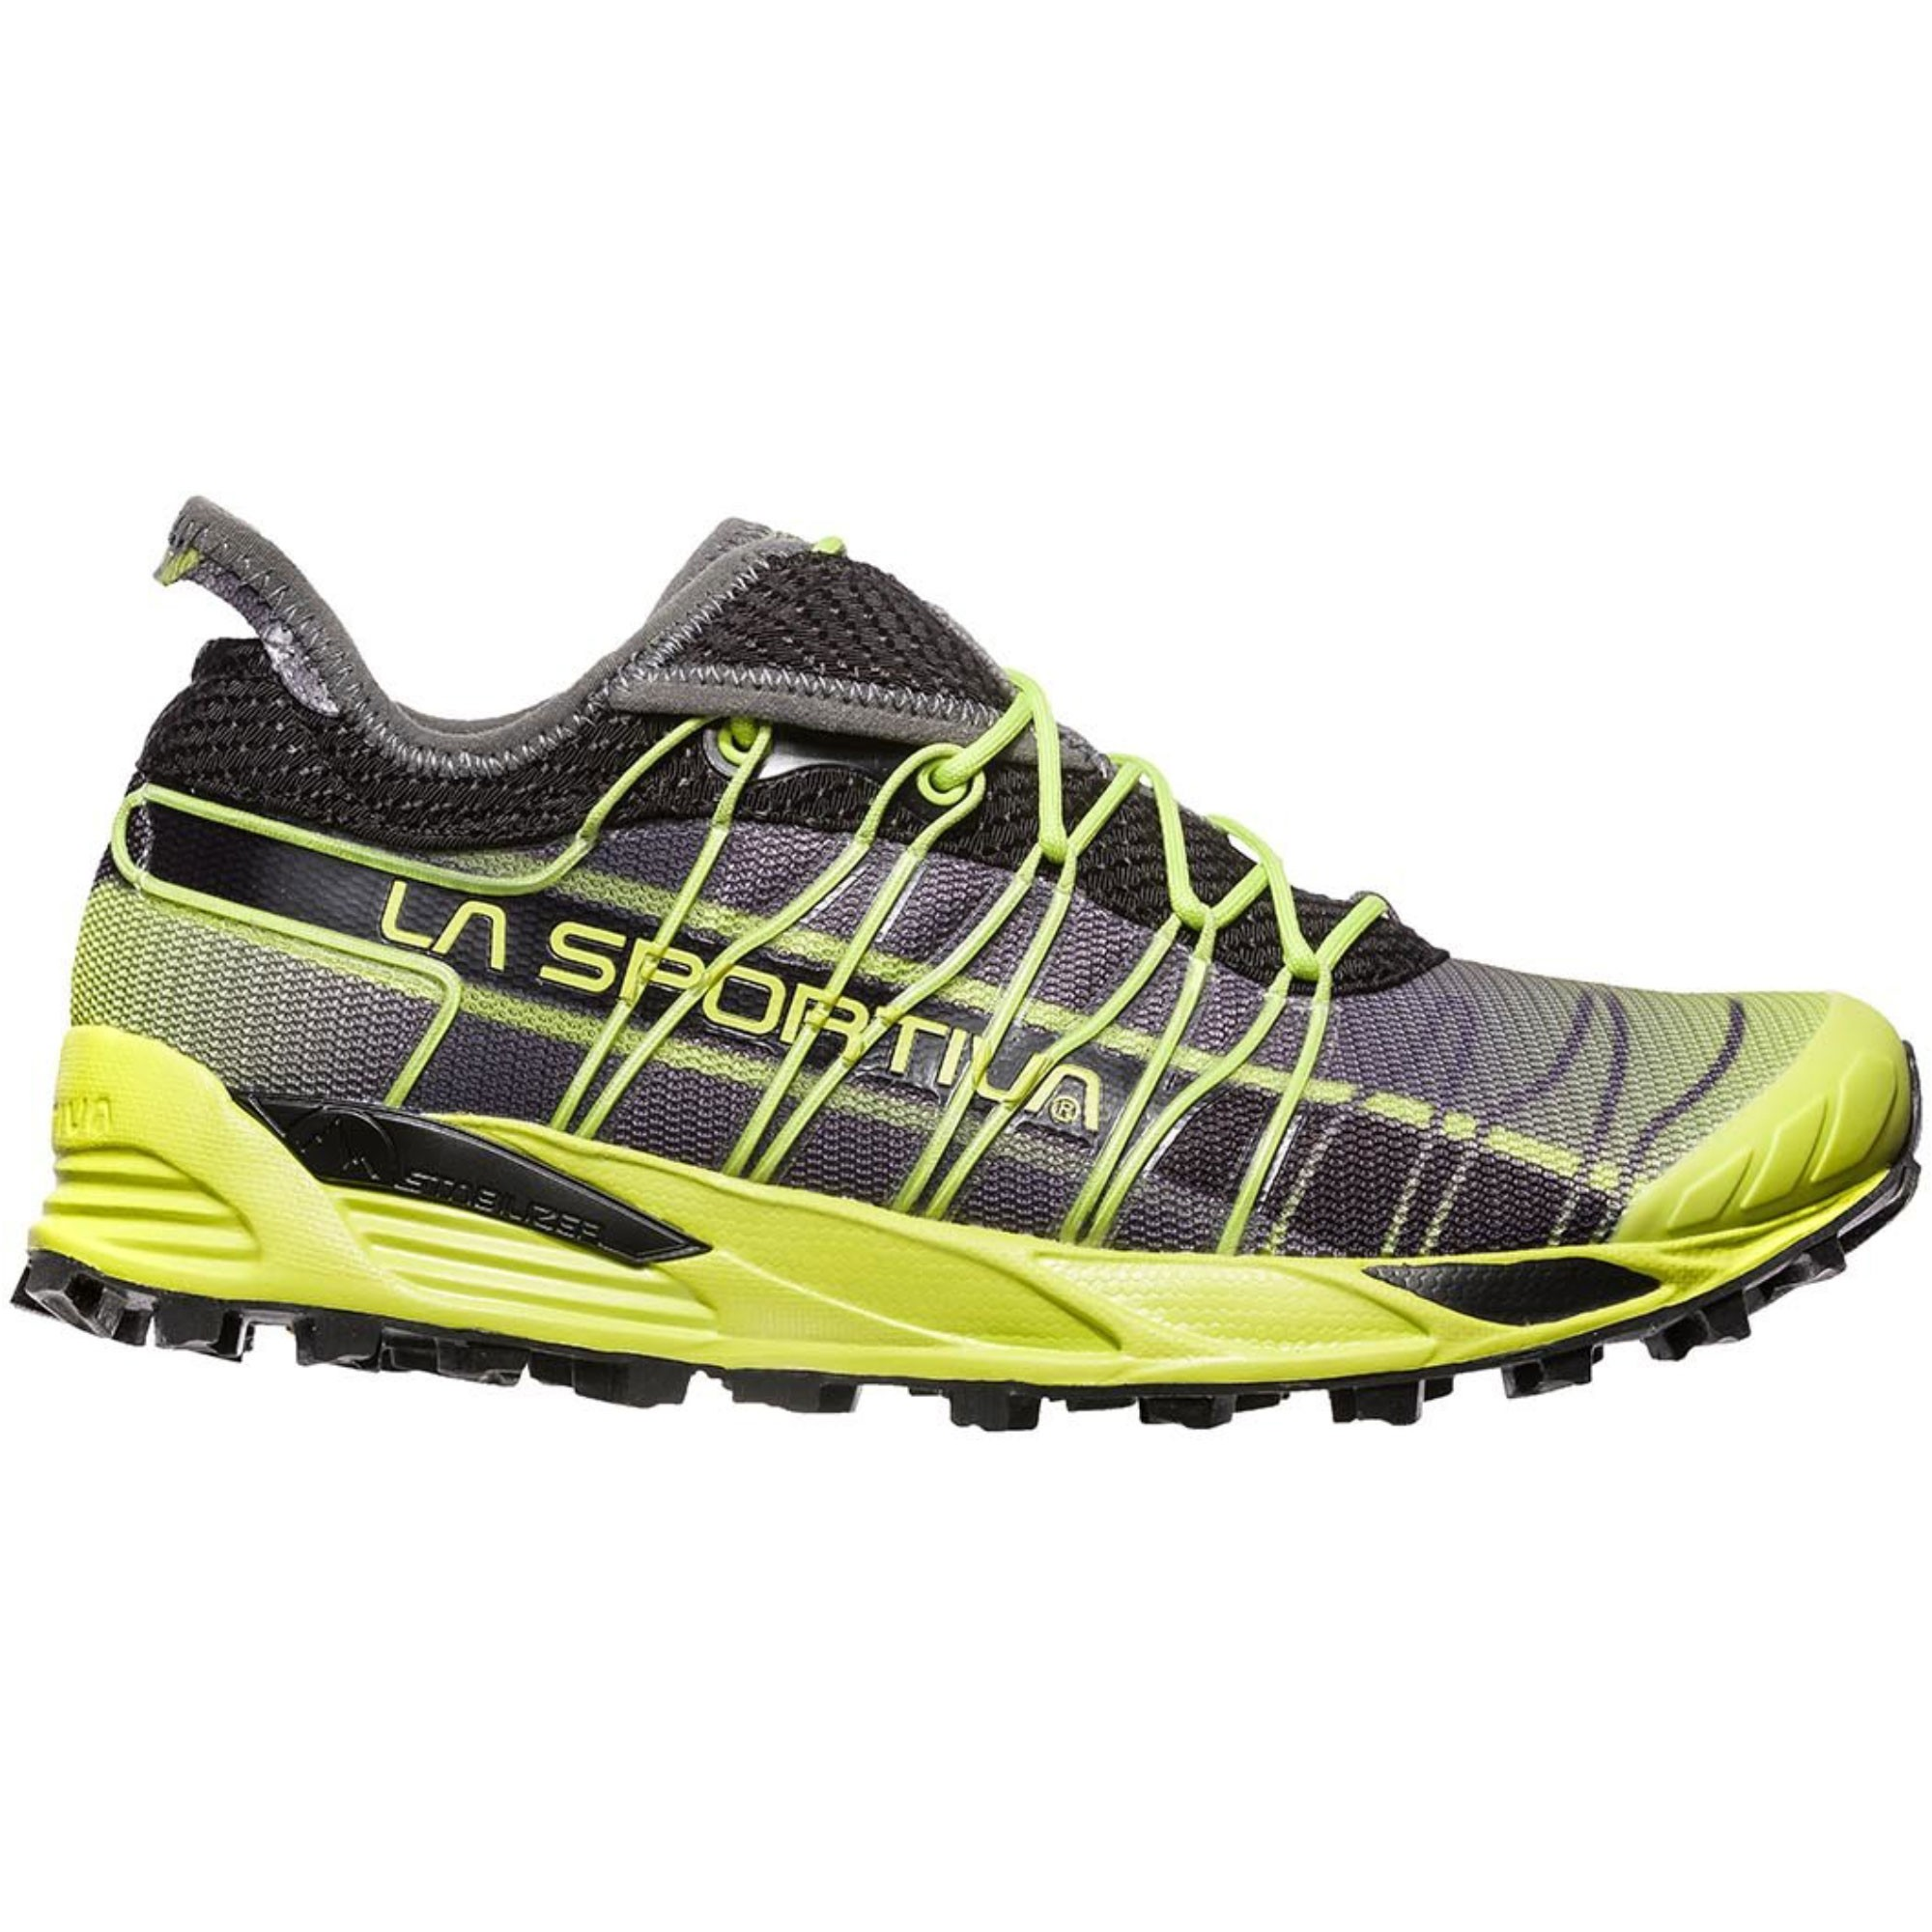 LA SPORTIVA - Mutant Trail Running Shoe - Men's - Apple Green/Carbon